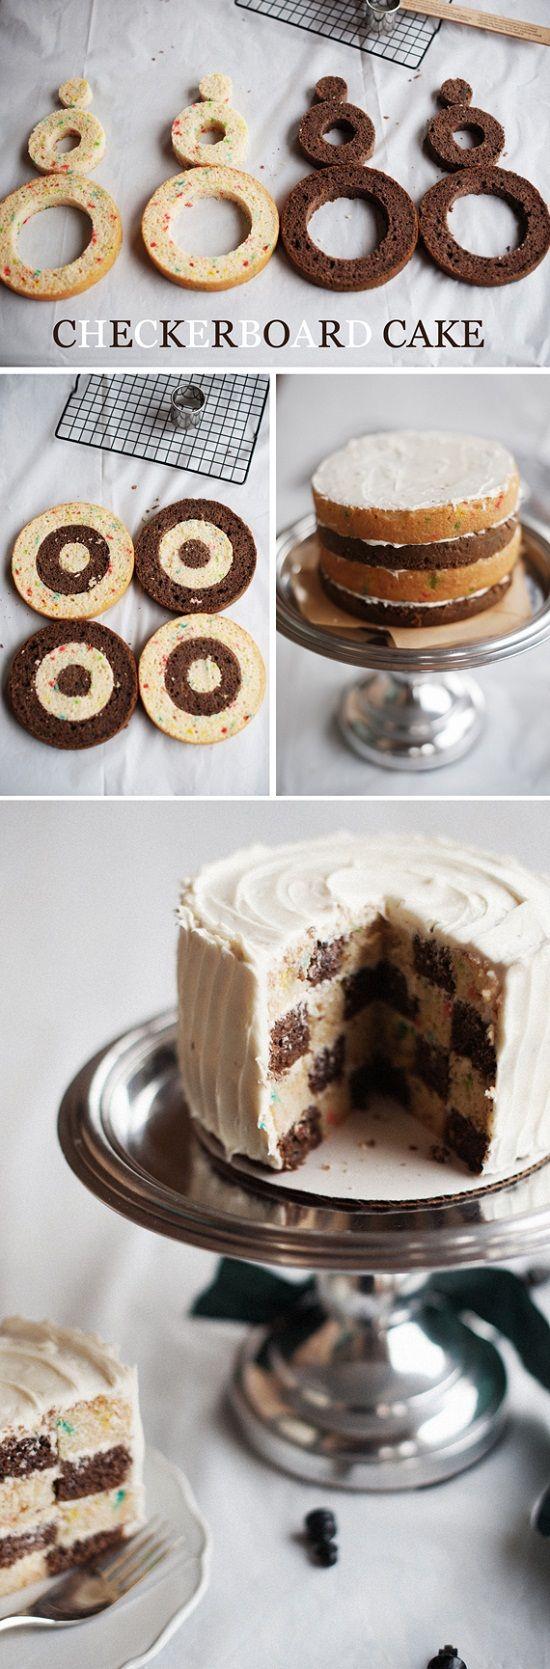 #KatieSheaDesign ??  ? #NationalCakeDay   ~  Simple Checkerboard Birthday Cake - Recipe Simple